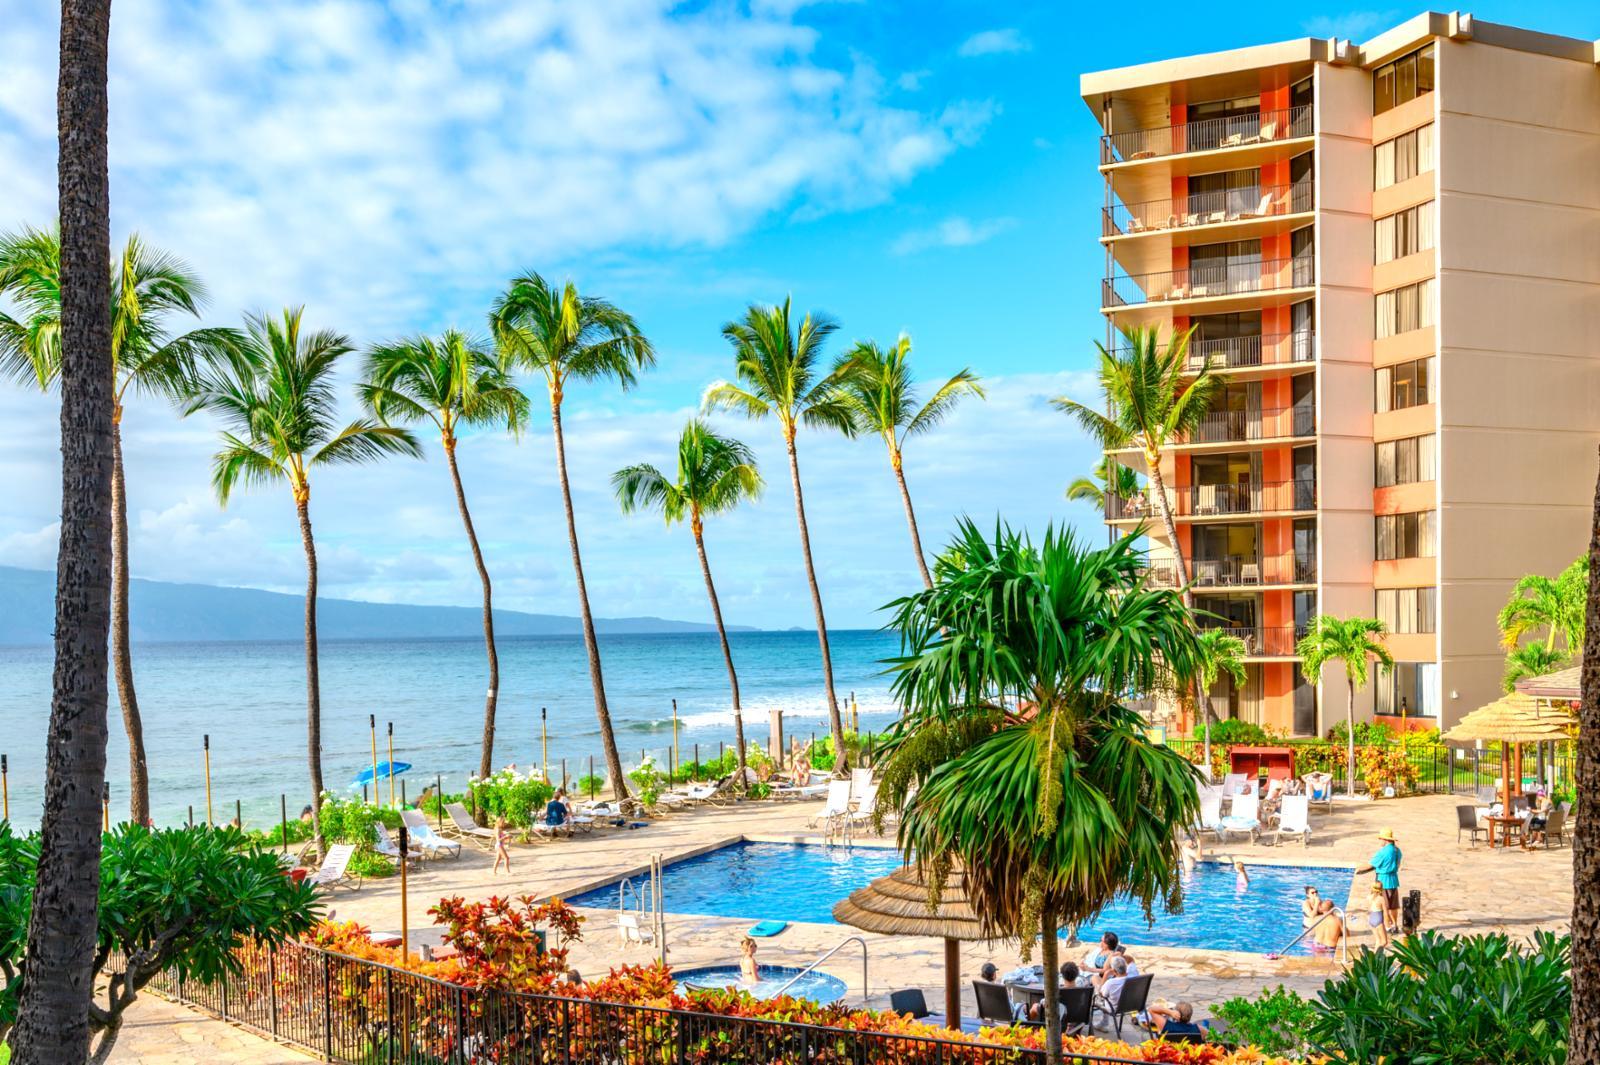 Just remodeled in july 2017. Kbm Hawaii Kaanapali Shores Ks 258 Luxury Vacation Rental At Kaanapali In West Maui On Maui Island